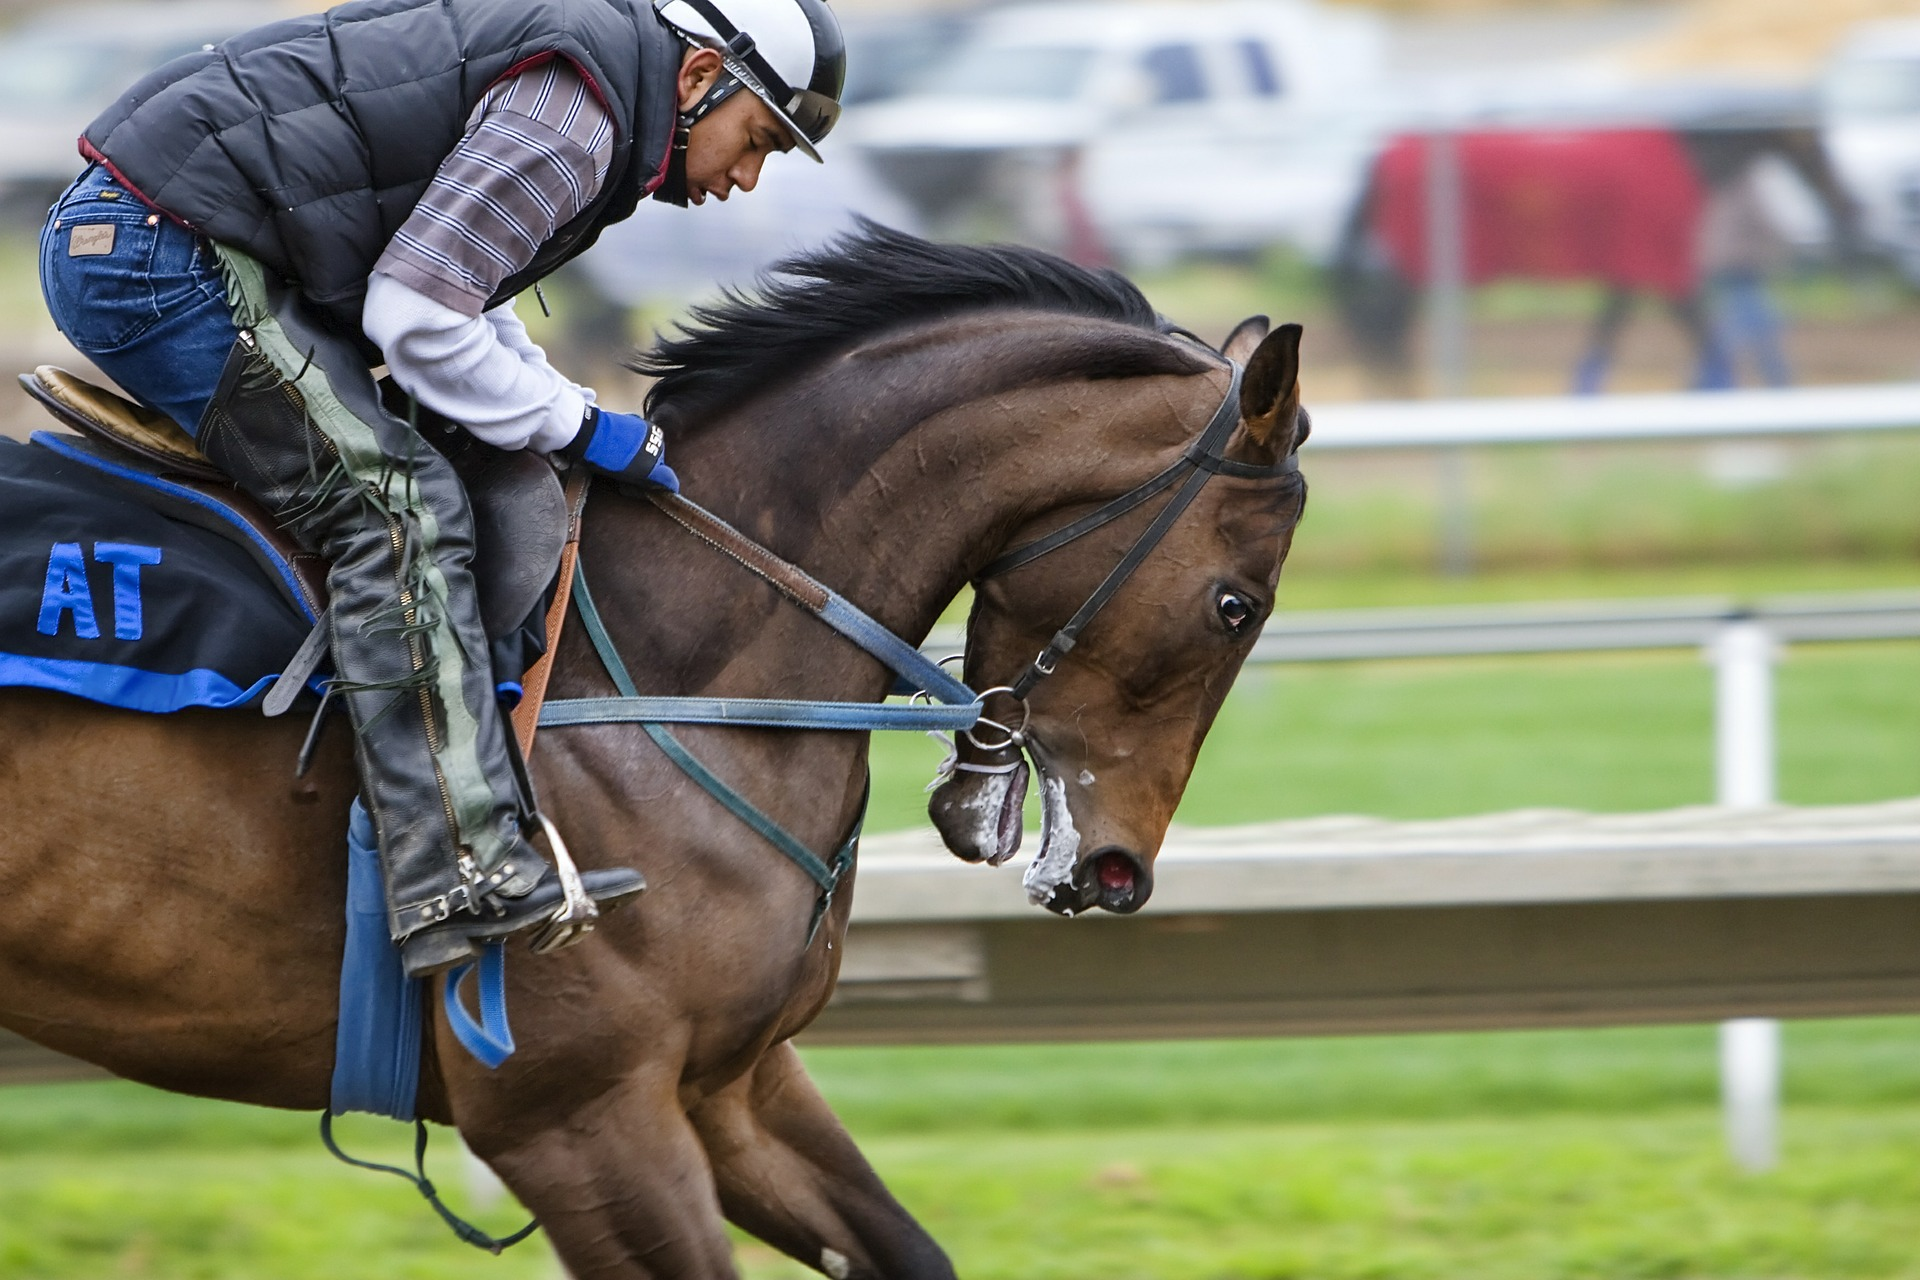 racehorse-419742_1920.jpg